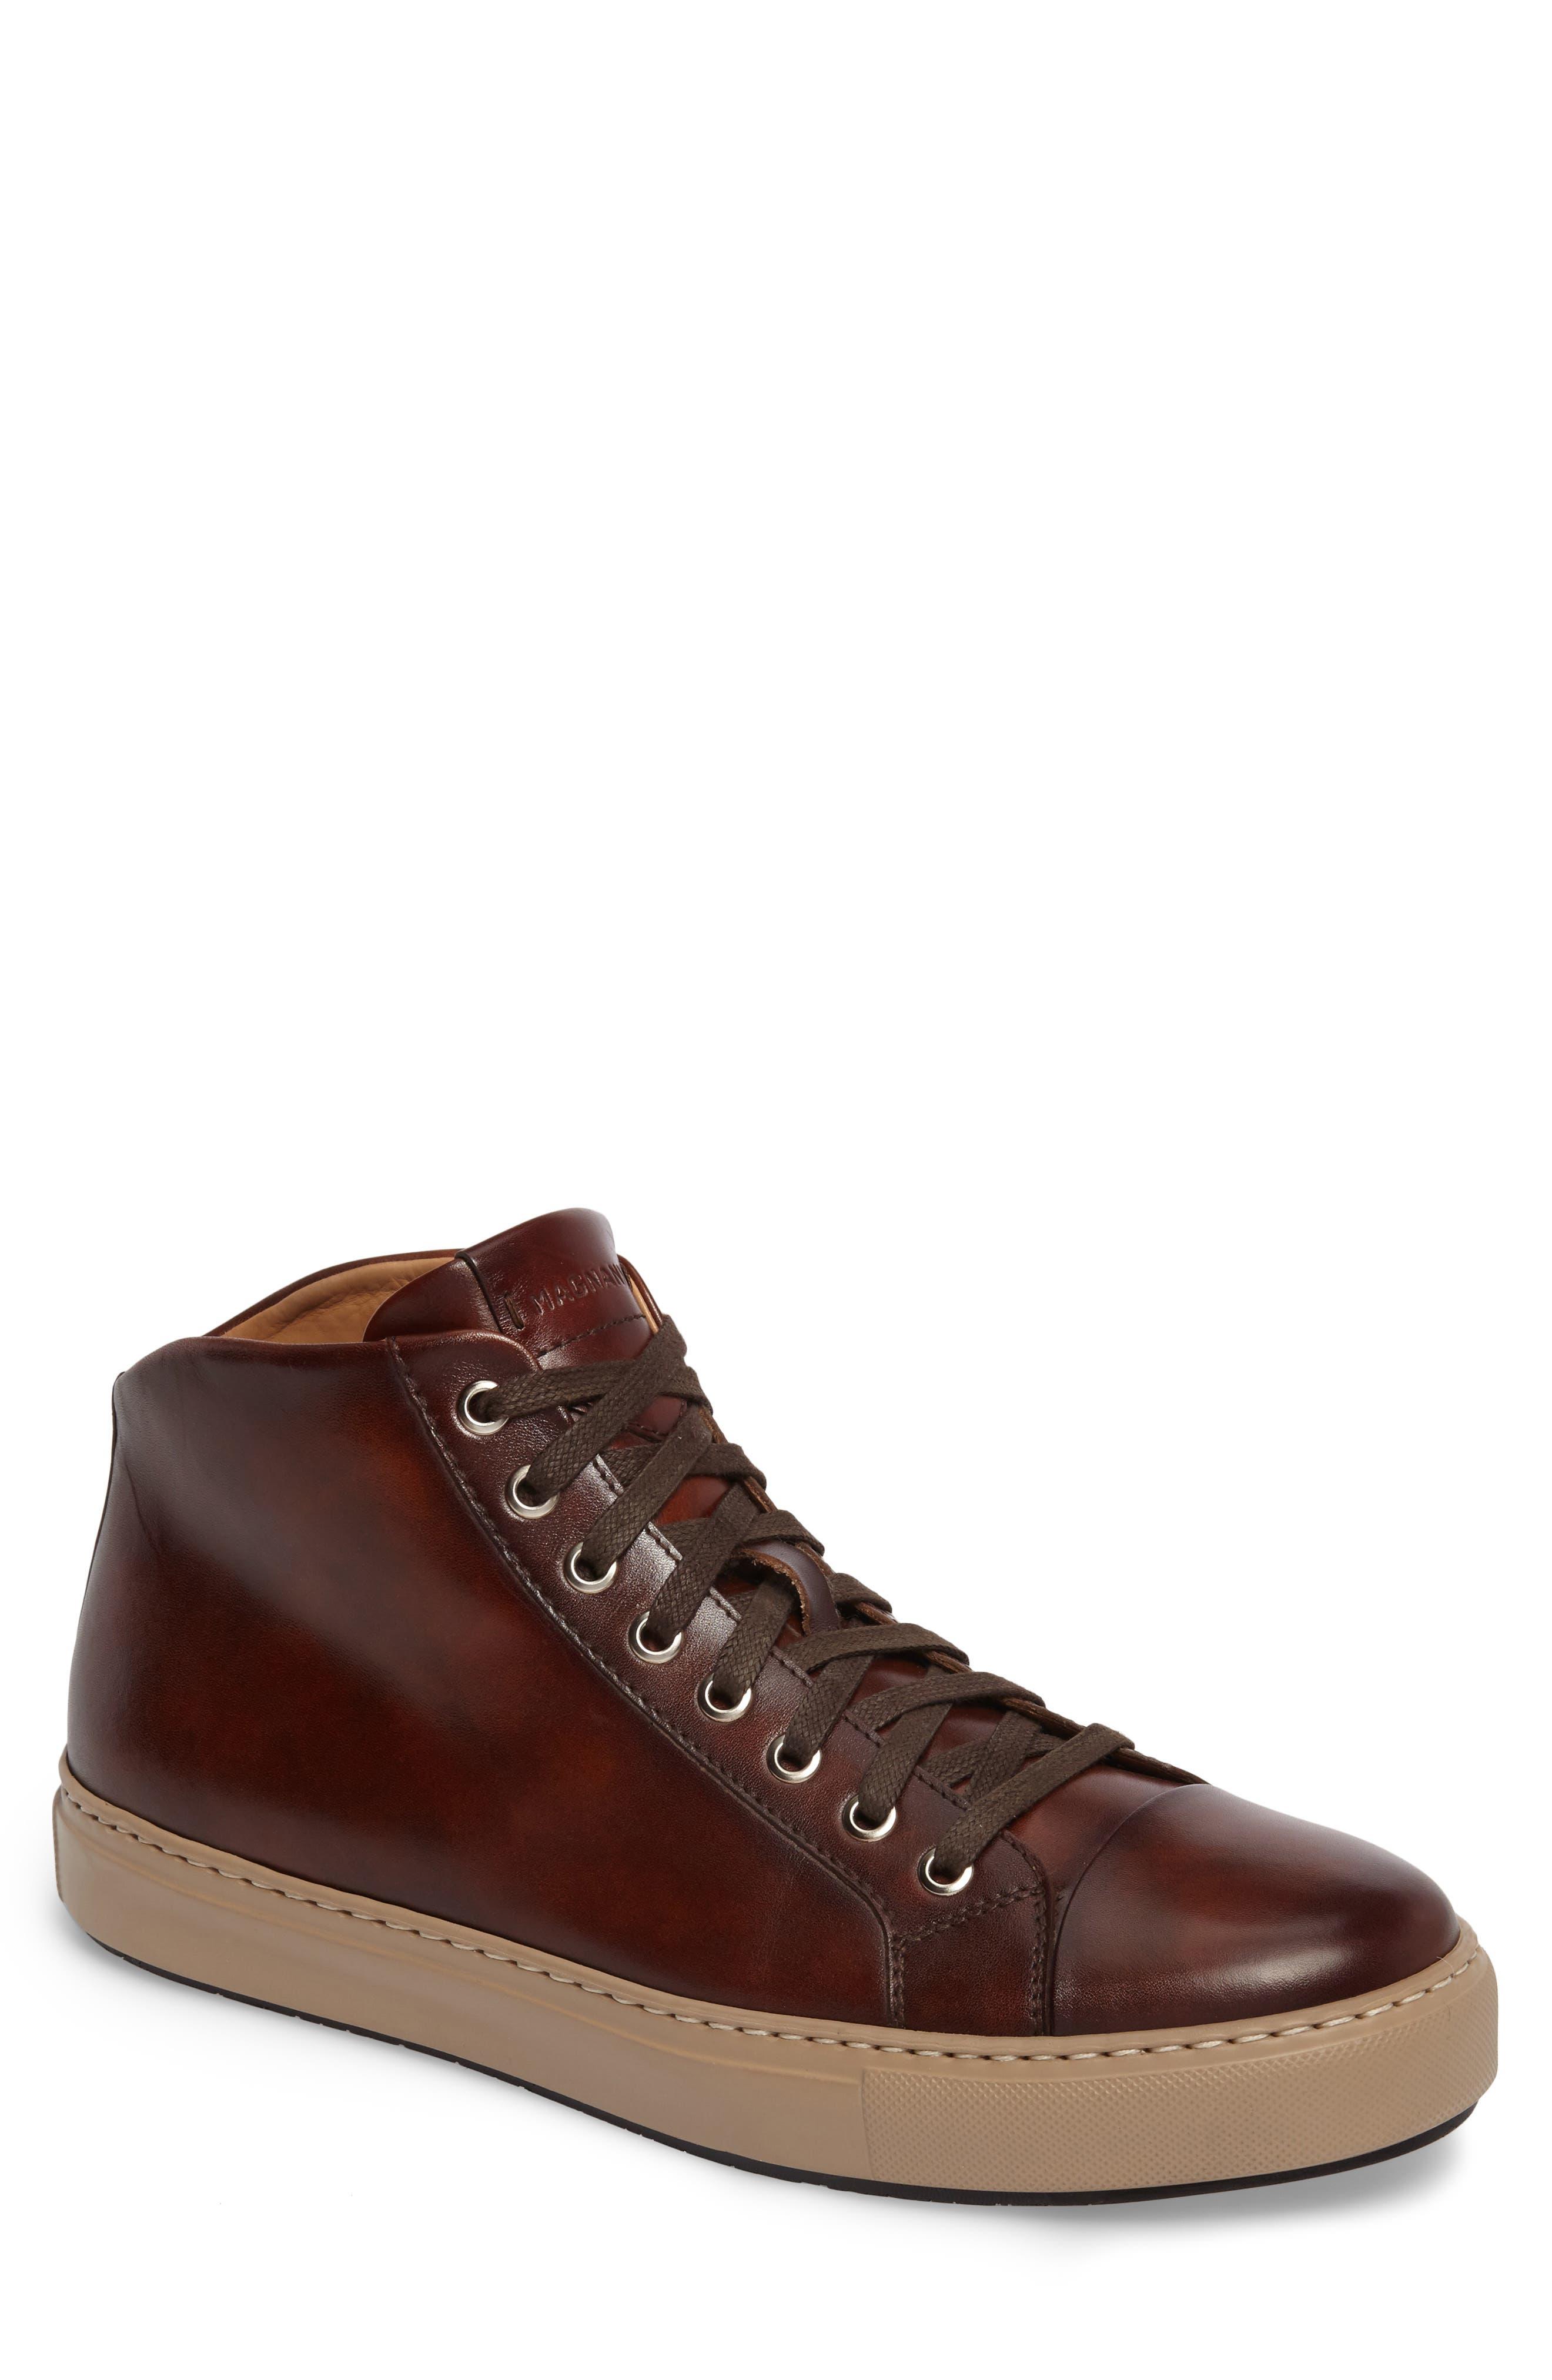 MAGNANNI,                             Kavon High Top Sneaker,                             Main thumbnail 1, color,                             245